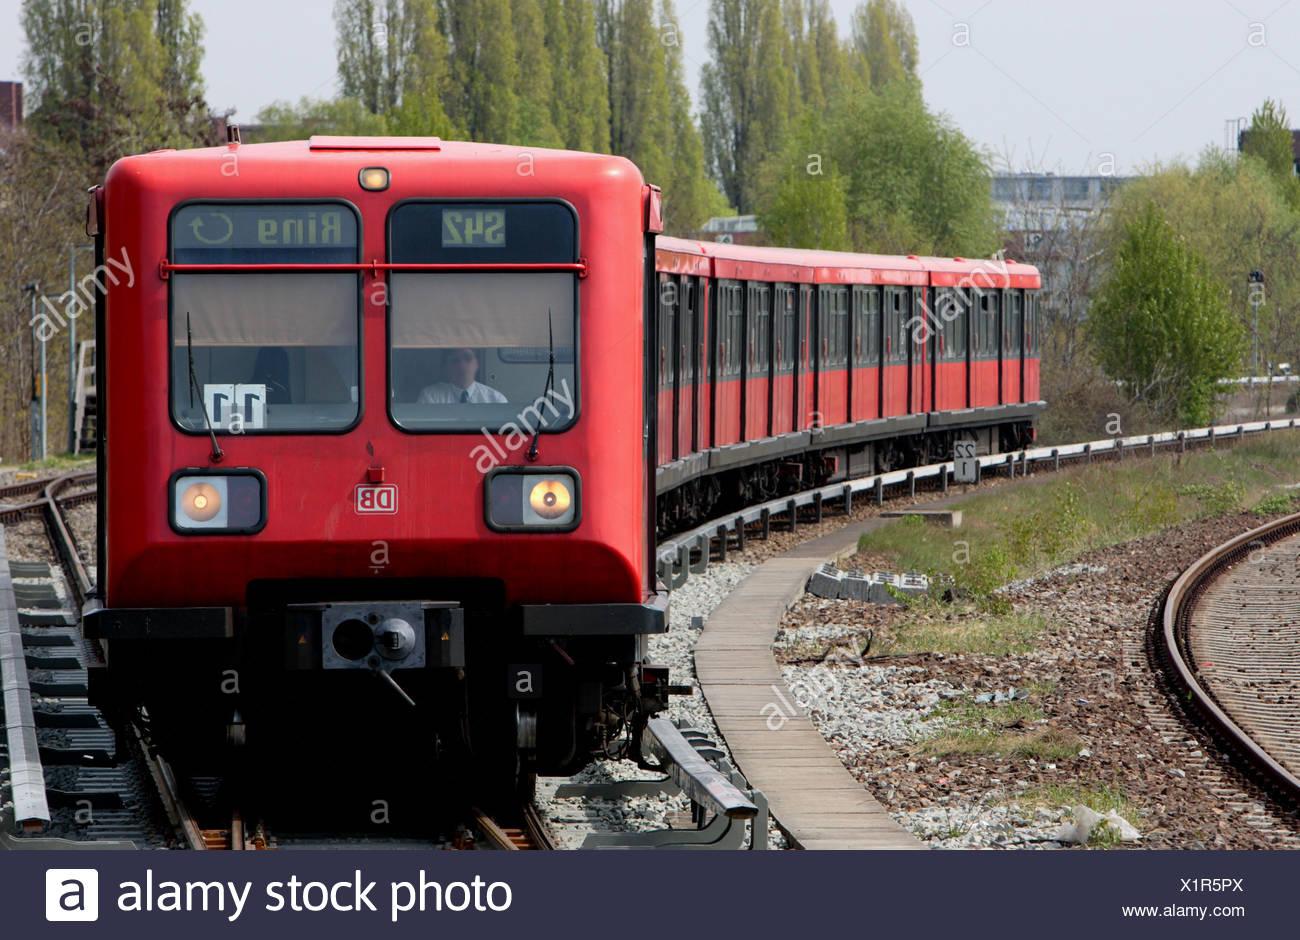 Berlin S-Bahn train line 42 - Stock Image